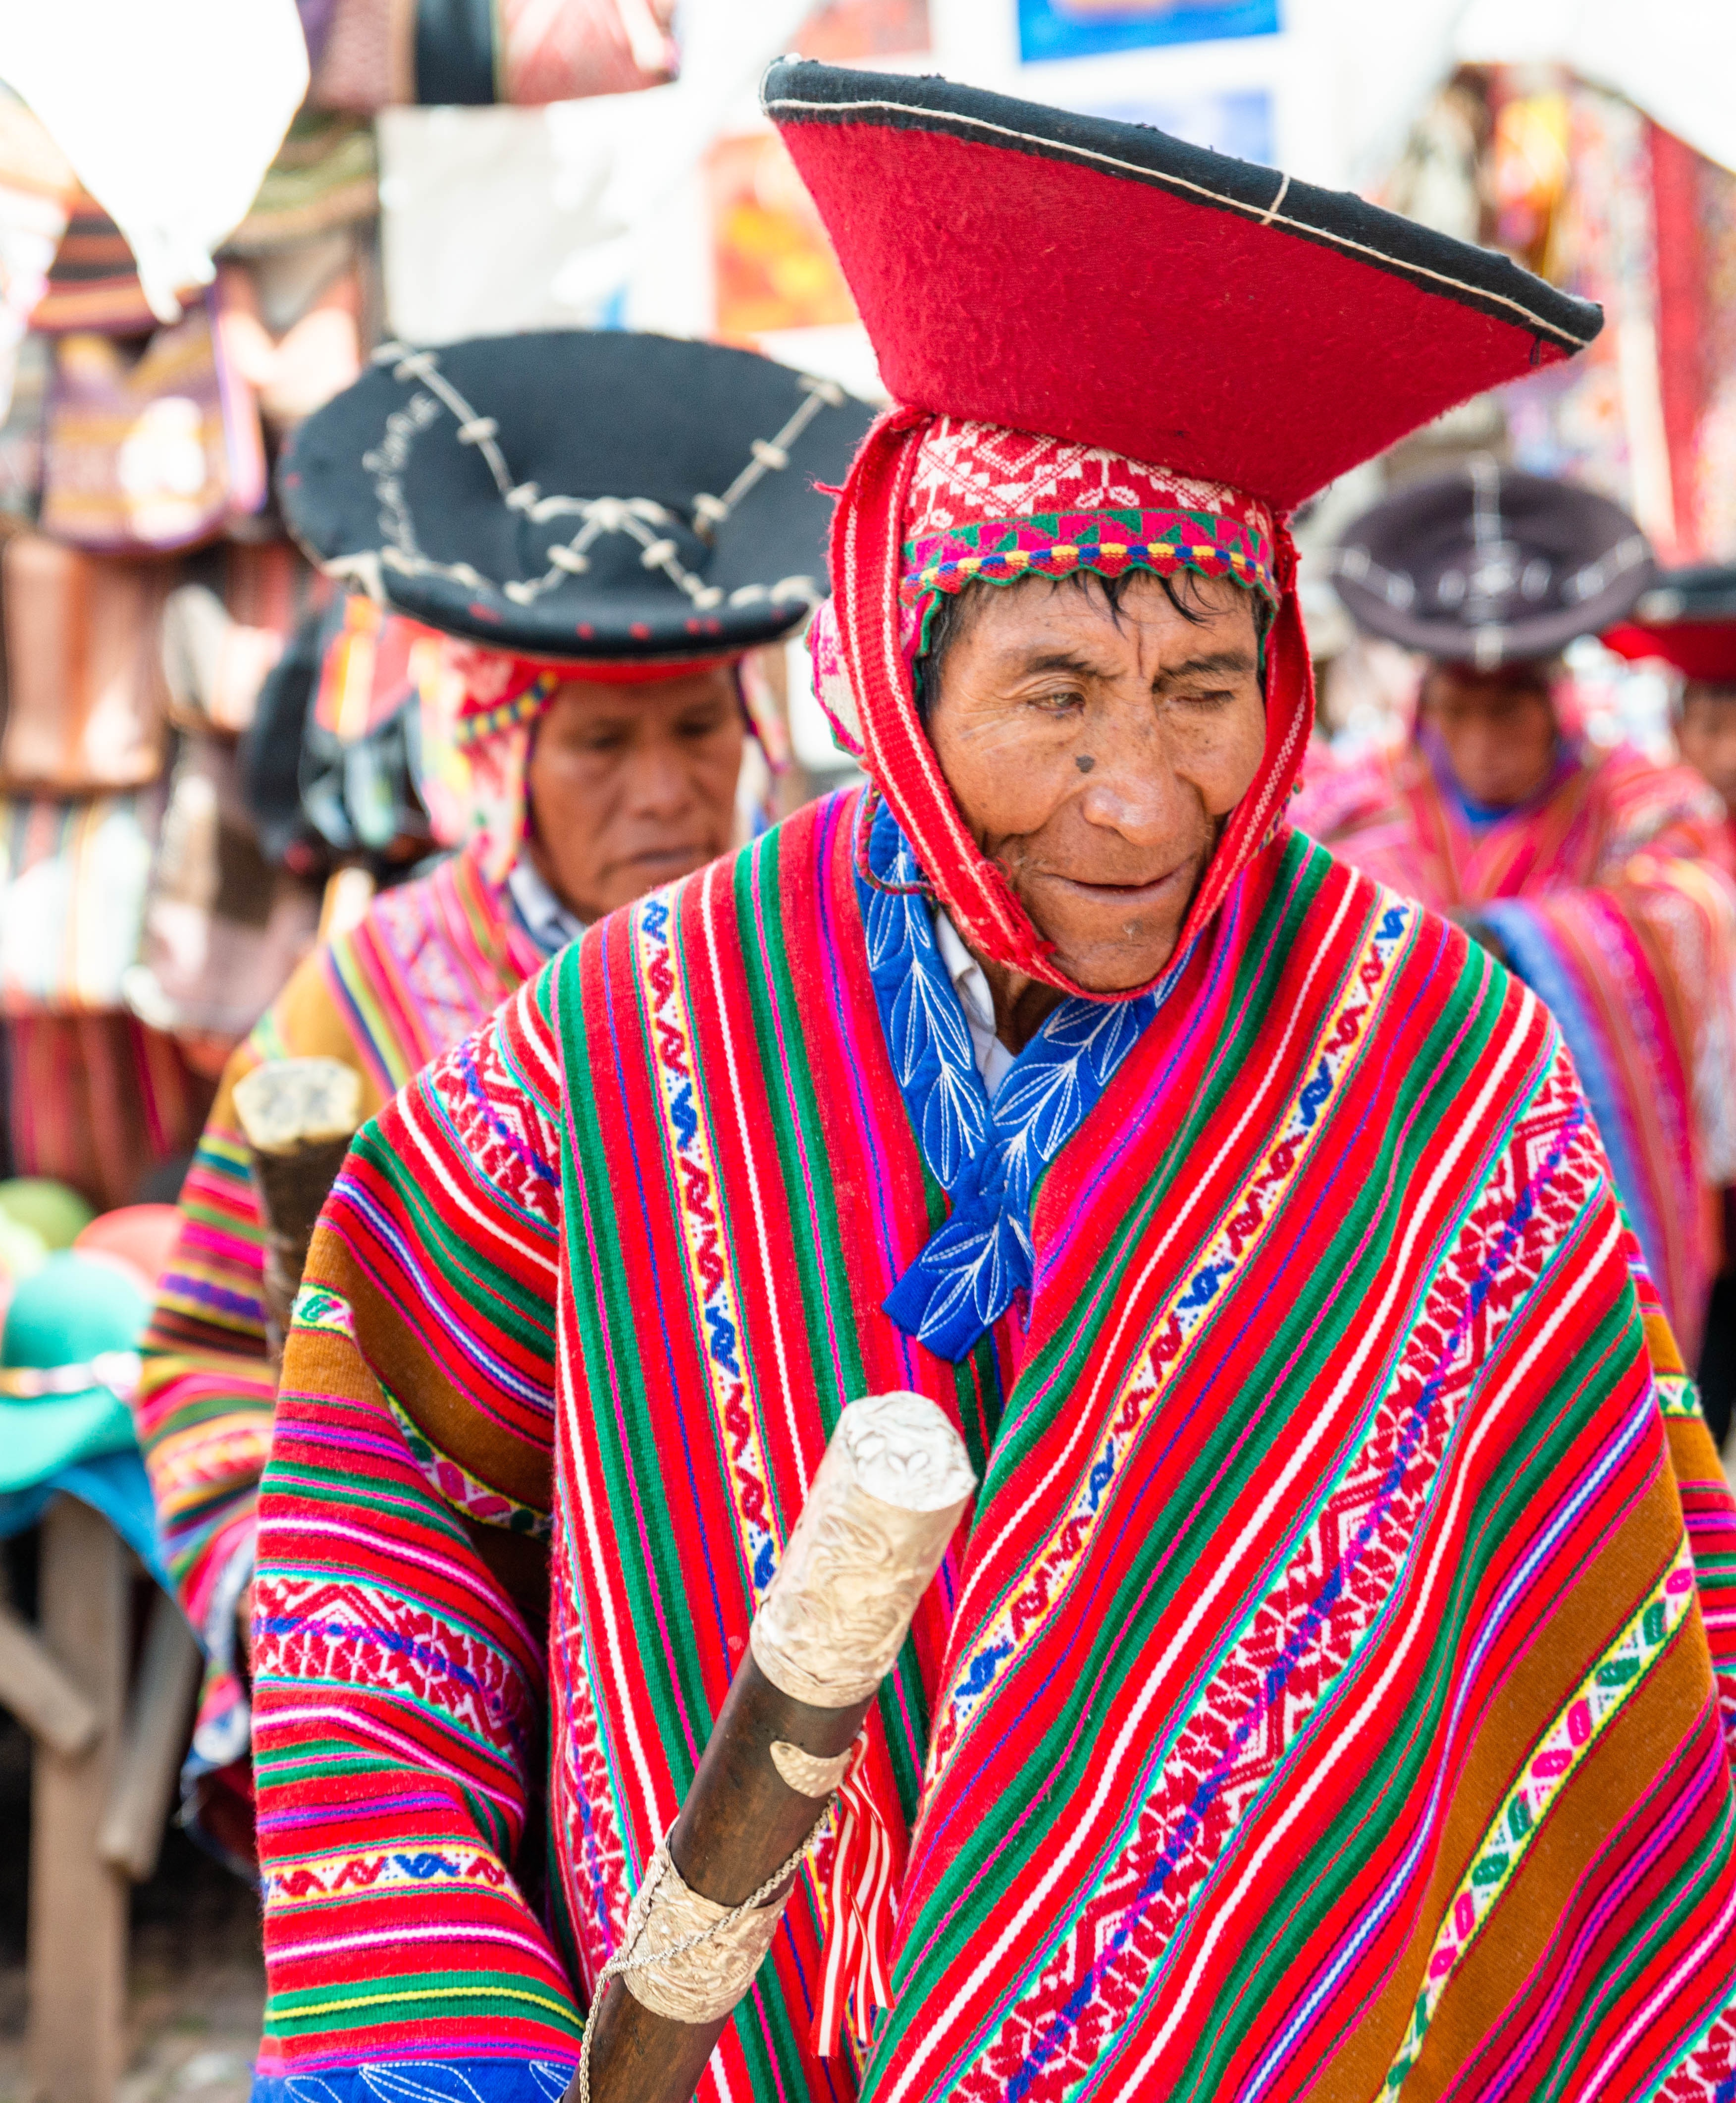 South America Peru Cusco Pisac Sacred Valley Quechua Quechua Indians Local Elders Peruvian Cultures Traditions Nikon D800